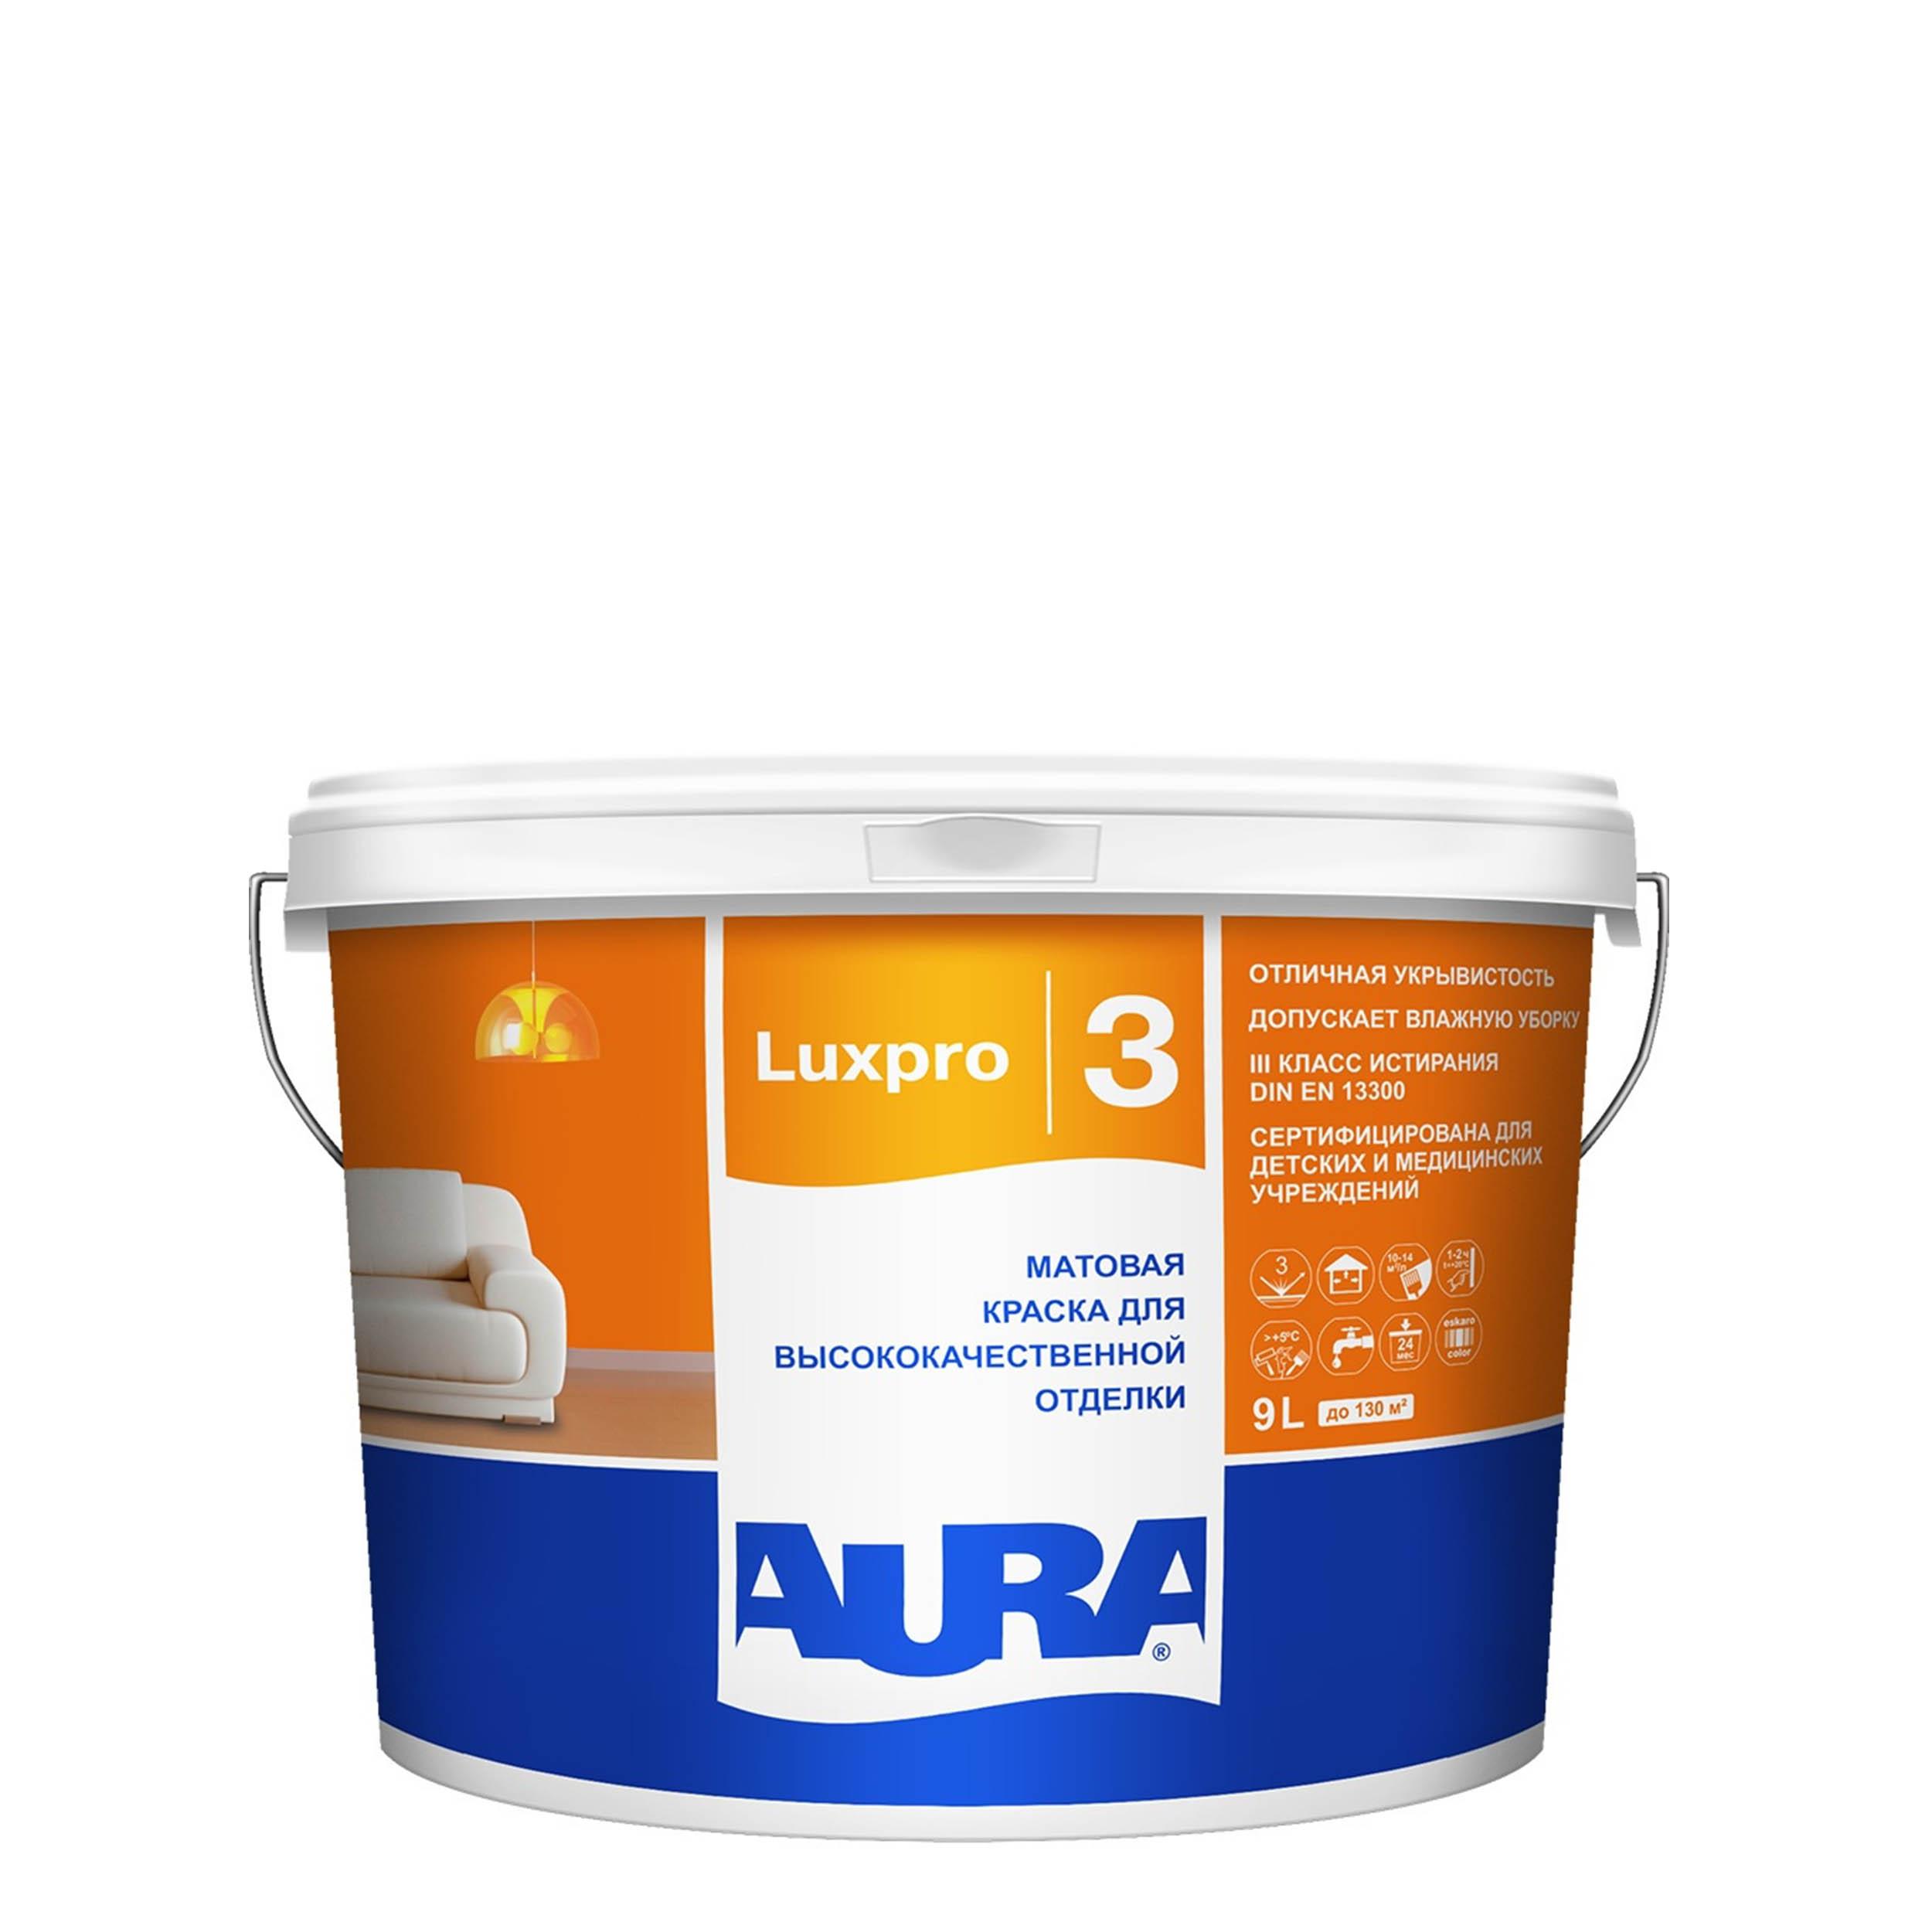 Фото 3 - Краска интерьерная, Aura LuxPRO 3, RAL 4010, 11 кг.